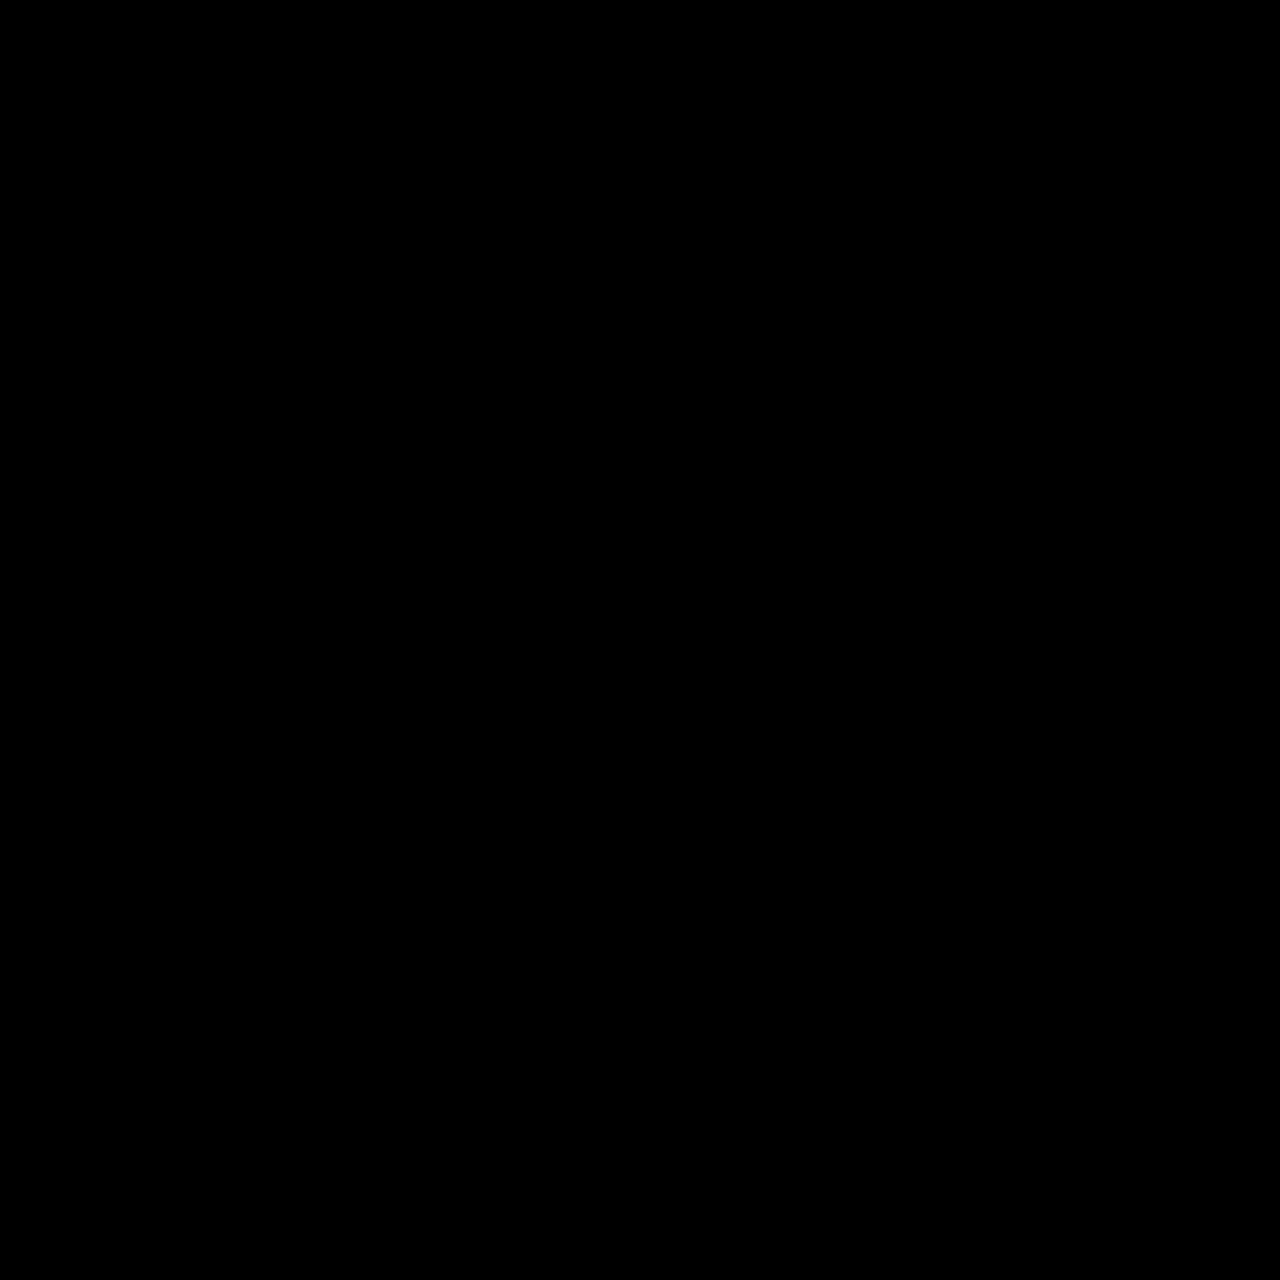 icon-4017417_1280